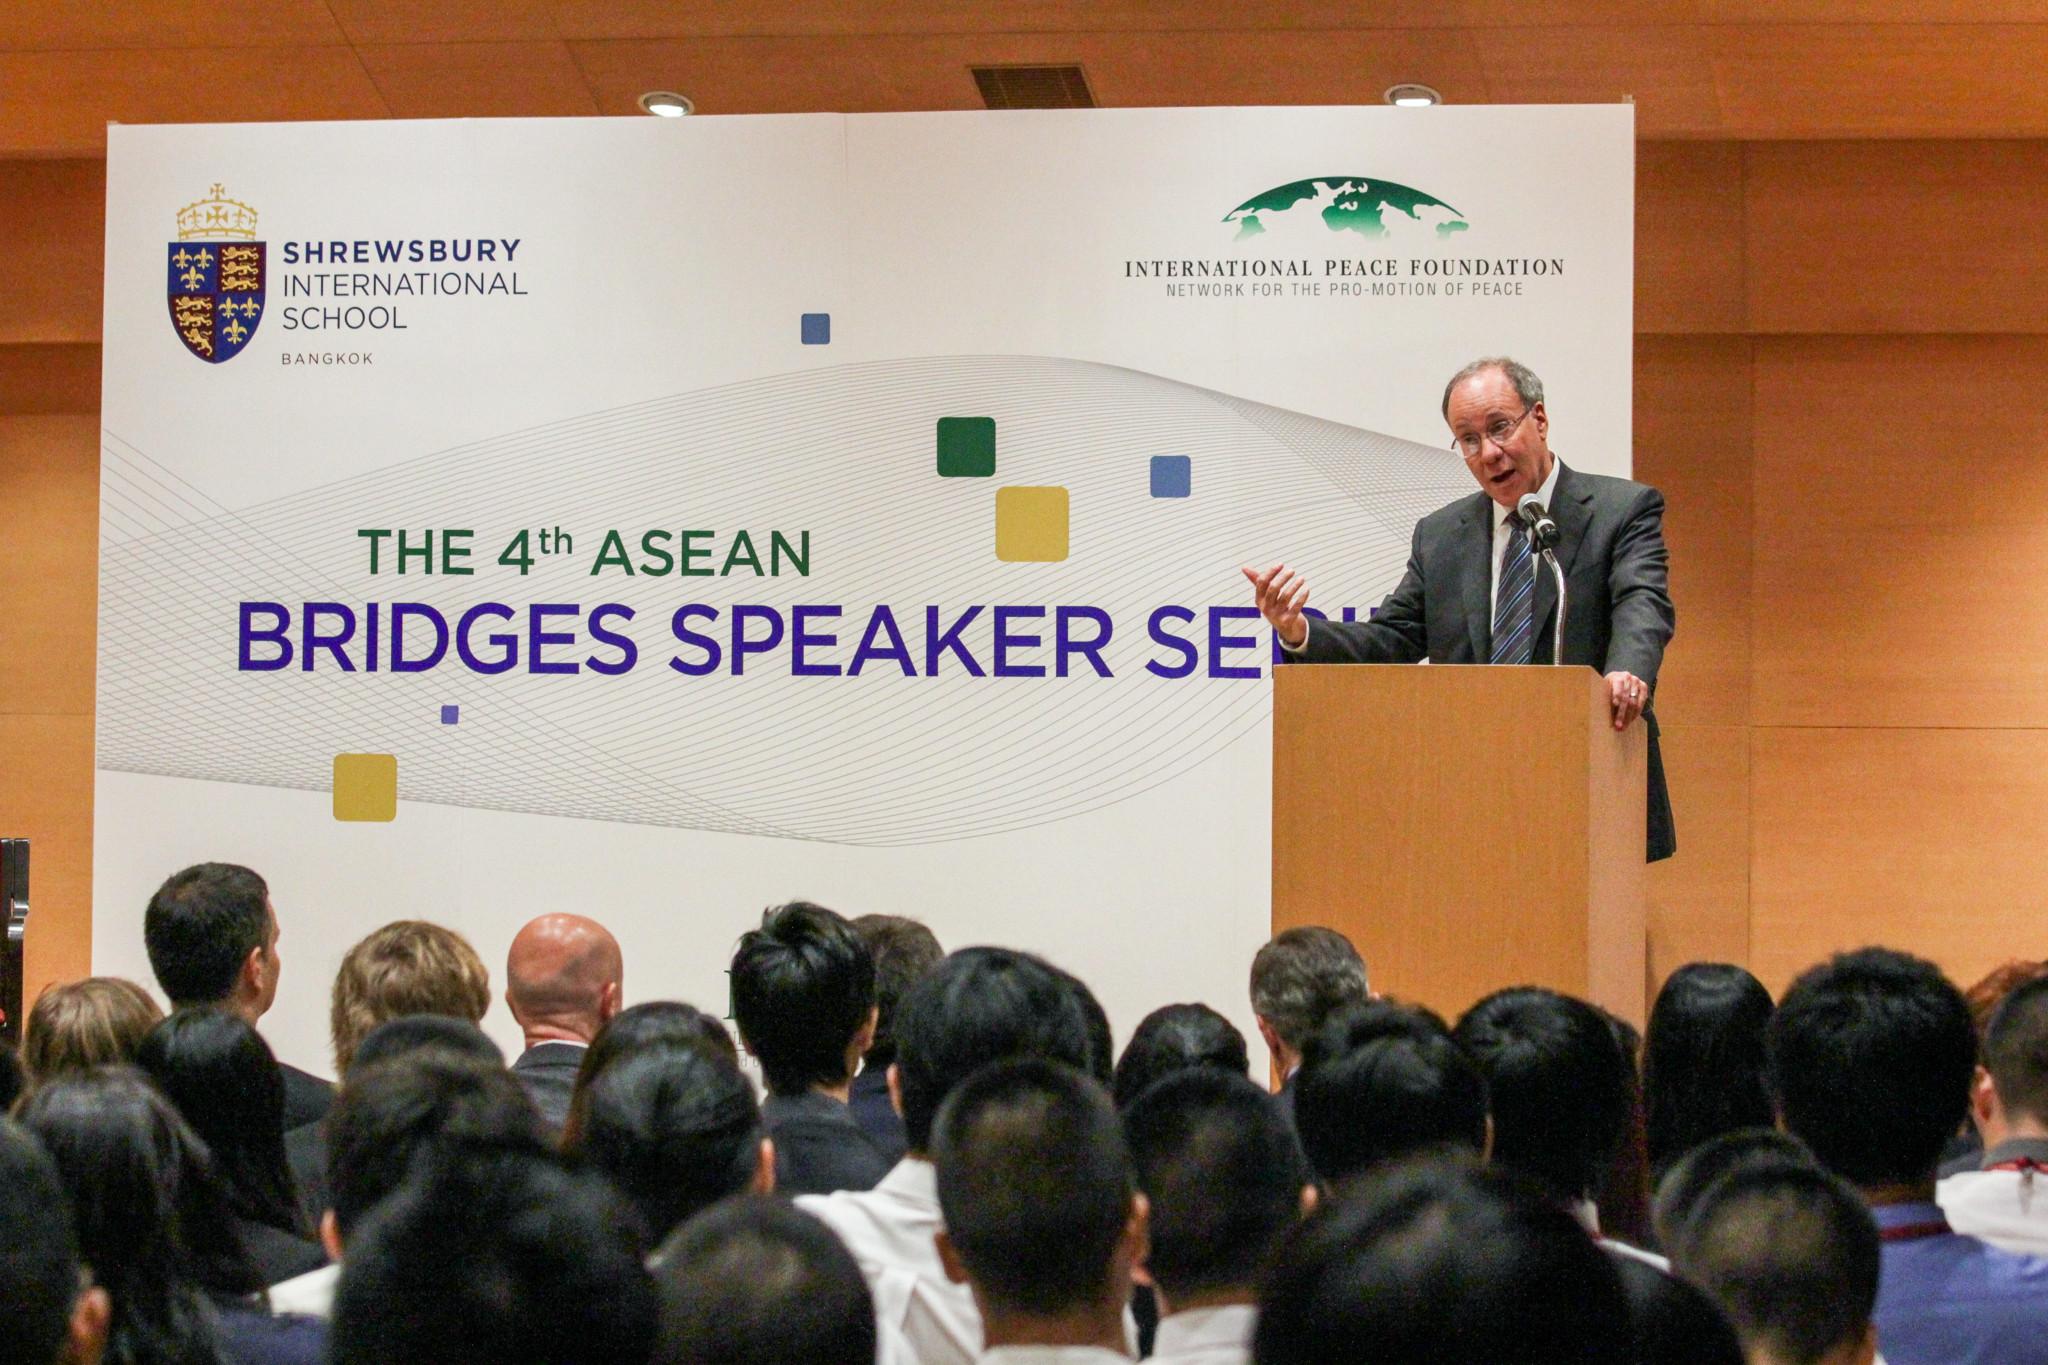 Economics Nobel Laureate Prof. Roger Myerson